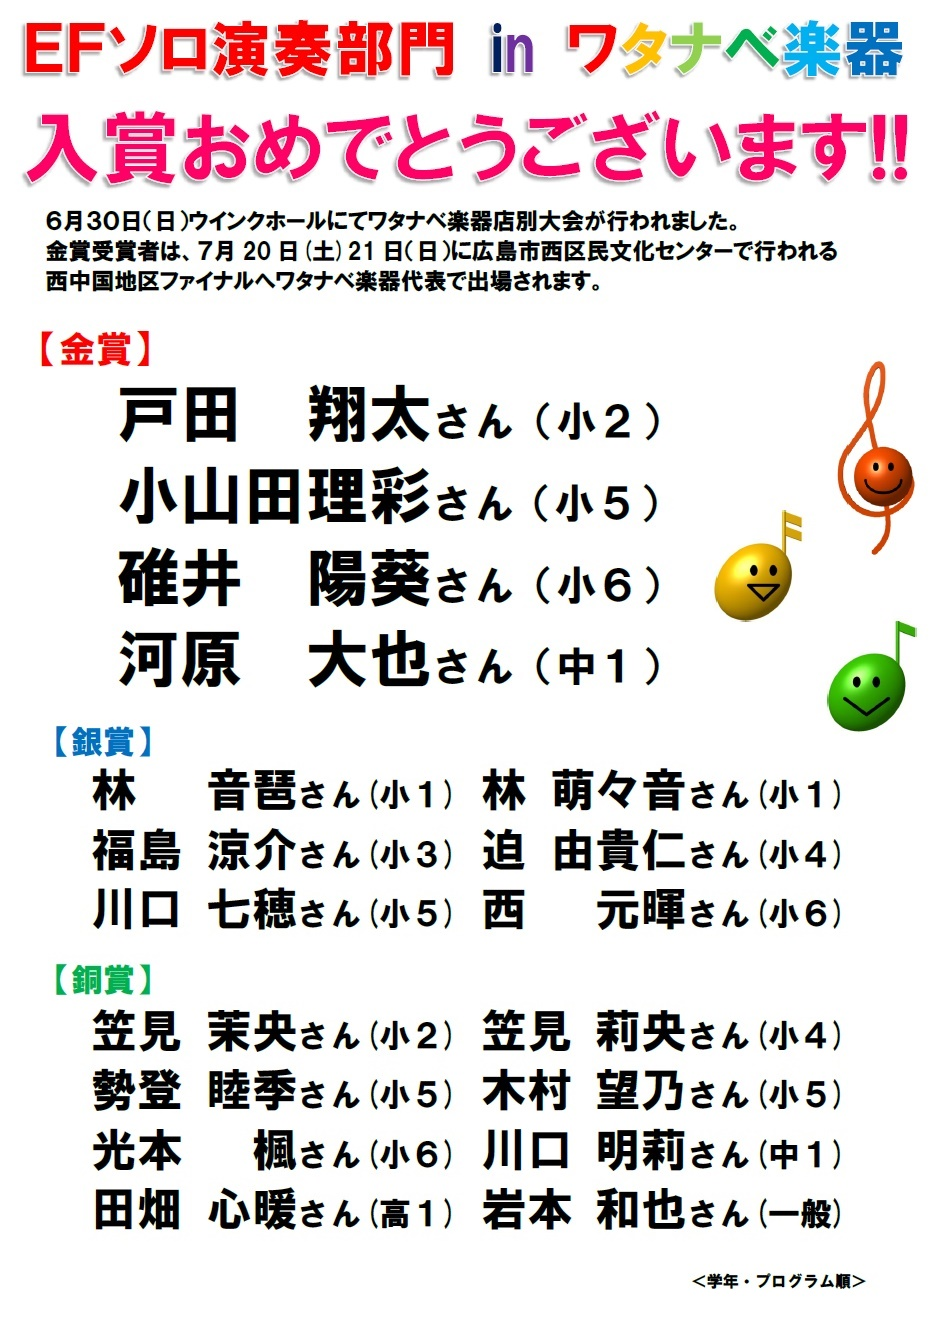 20190701efwatanabe